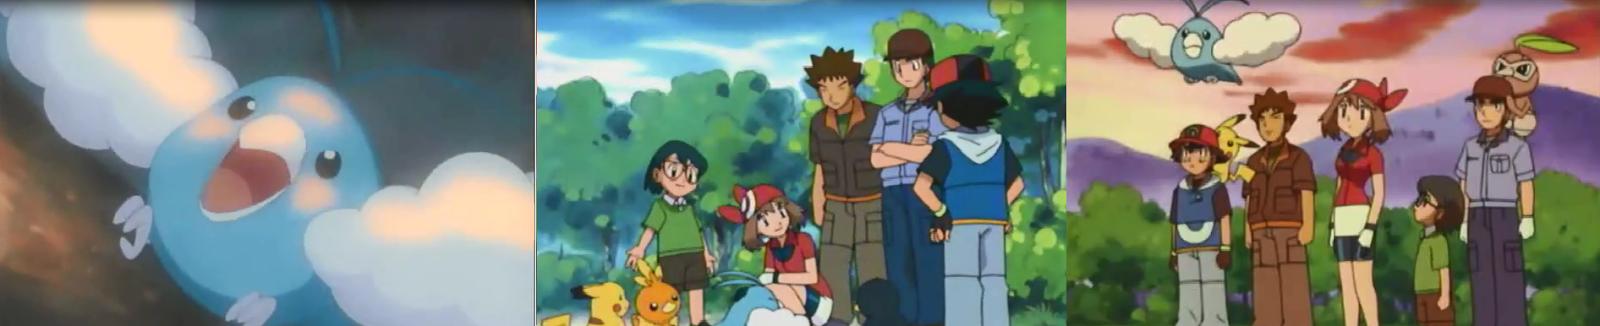 Pokemon Capitulo 24 Temporada 7 Rescatando a Swablu